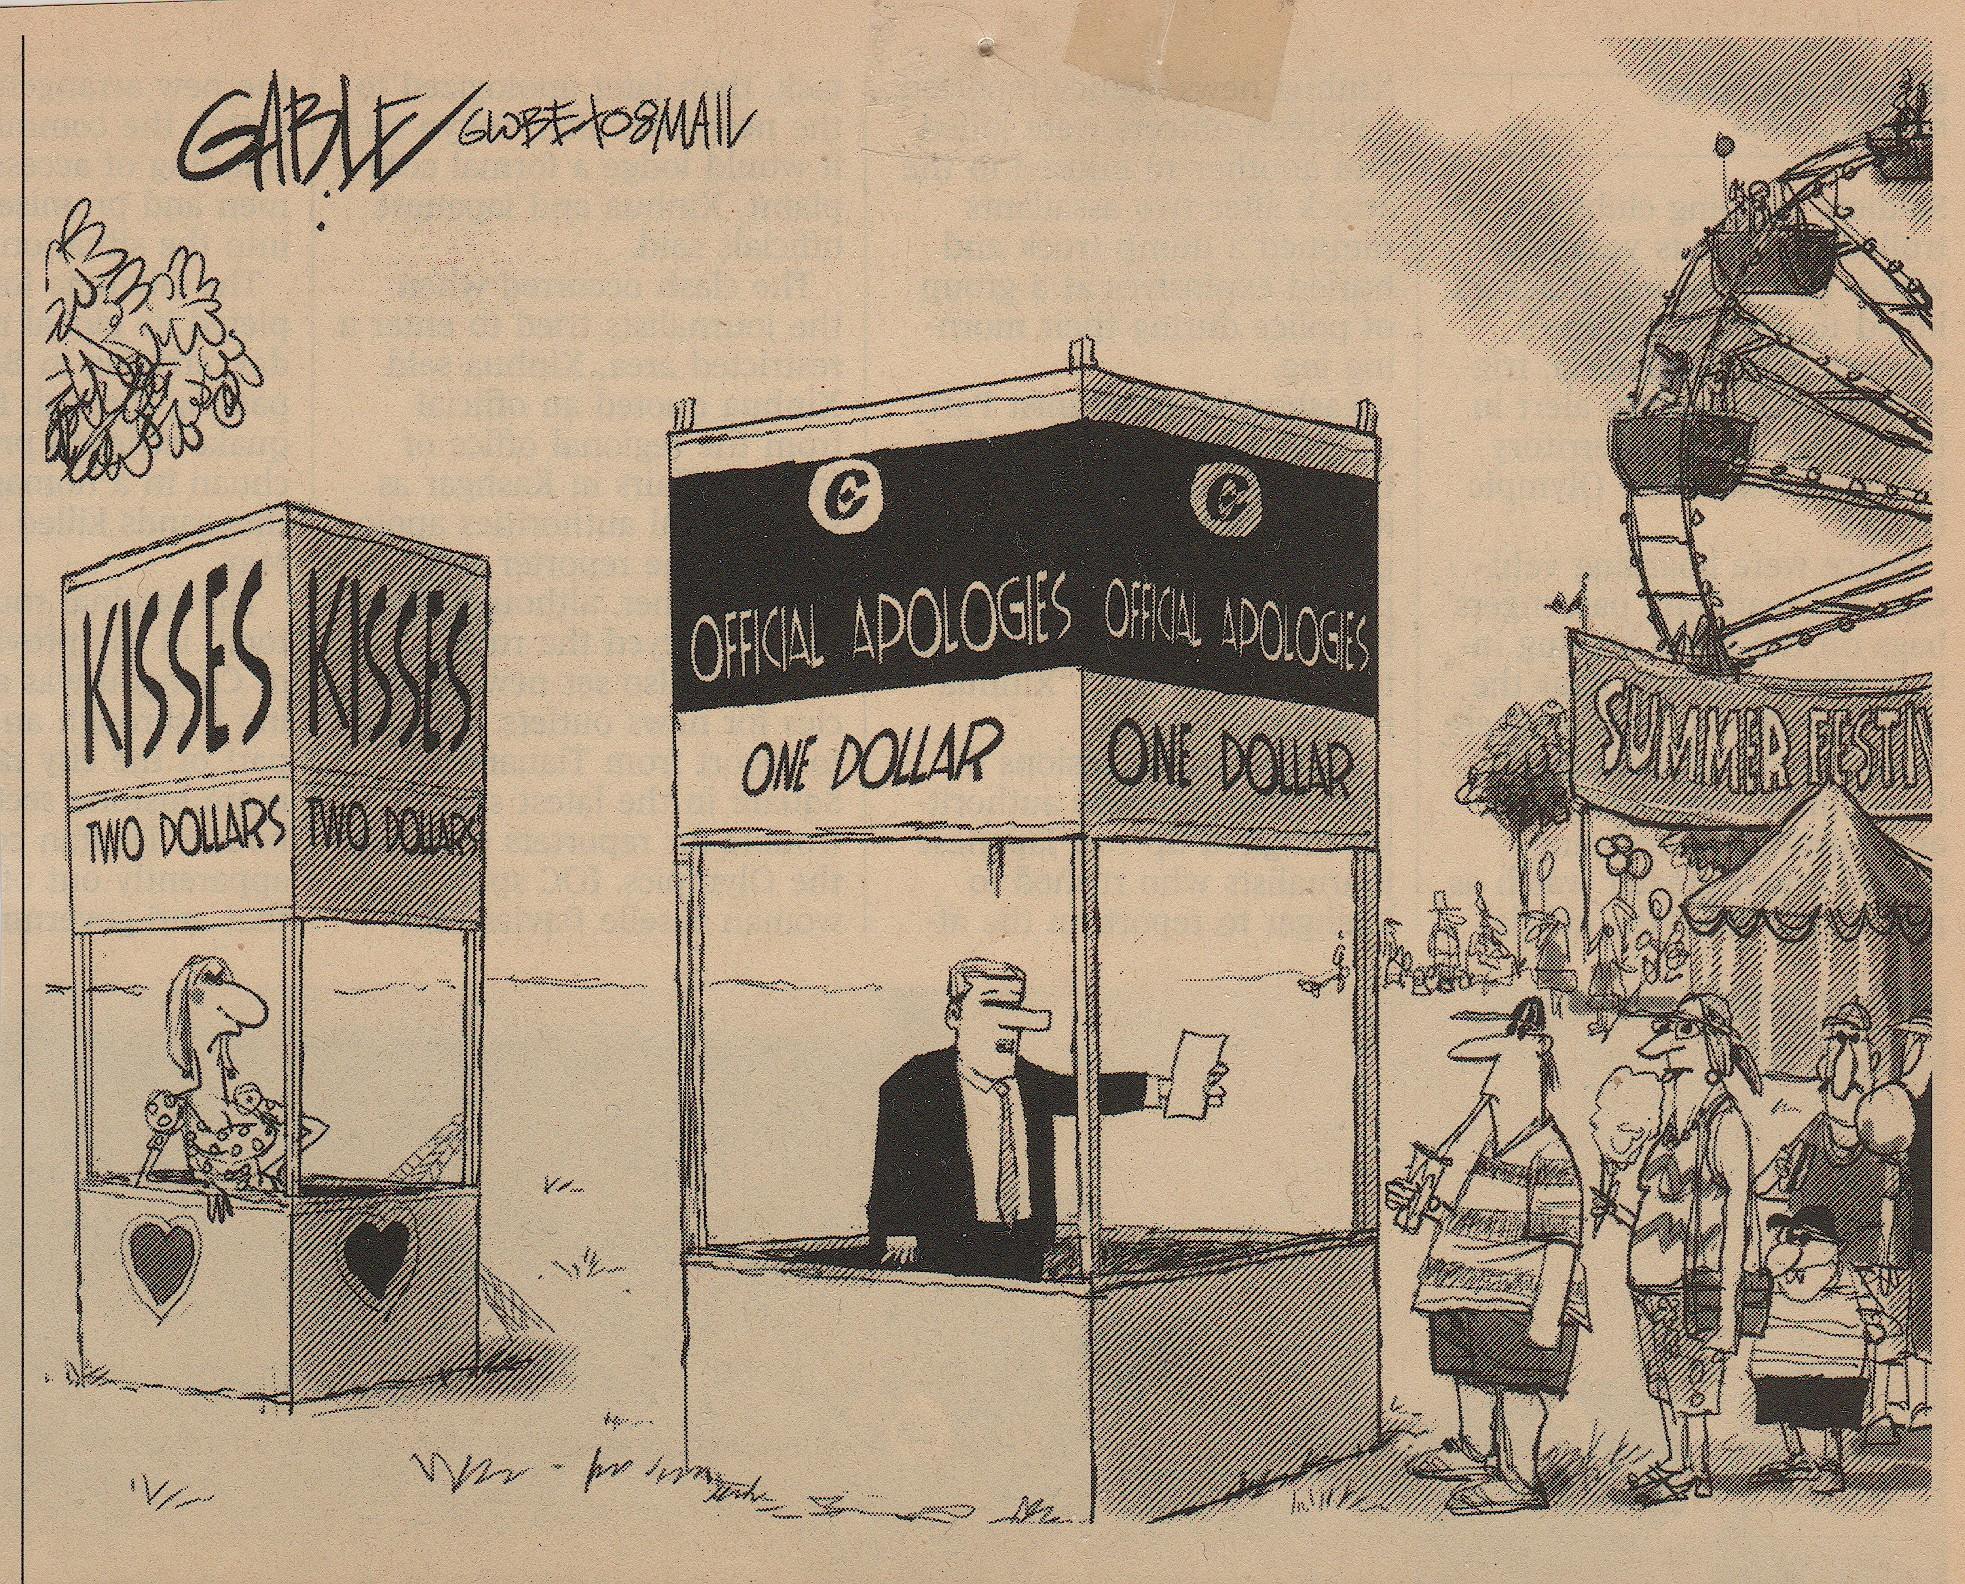 Harper appology cartoon